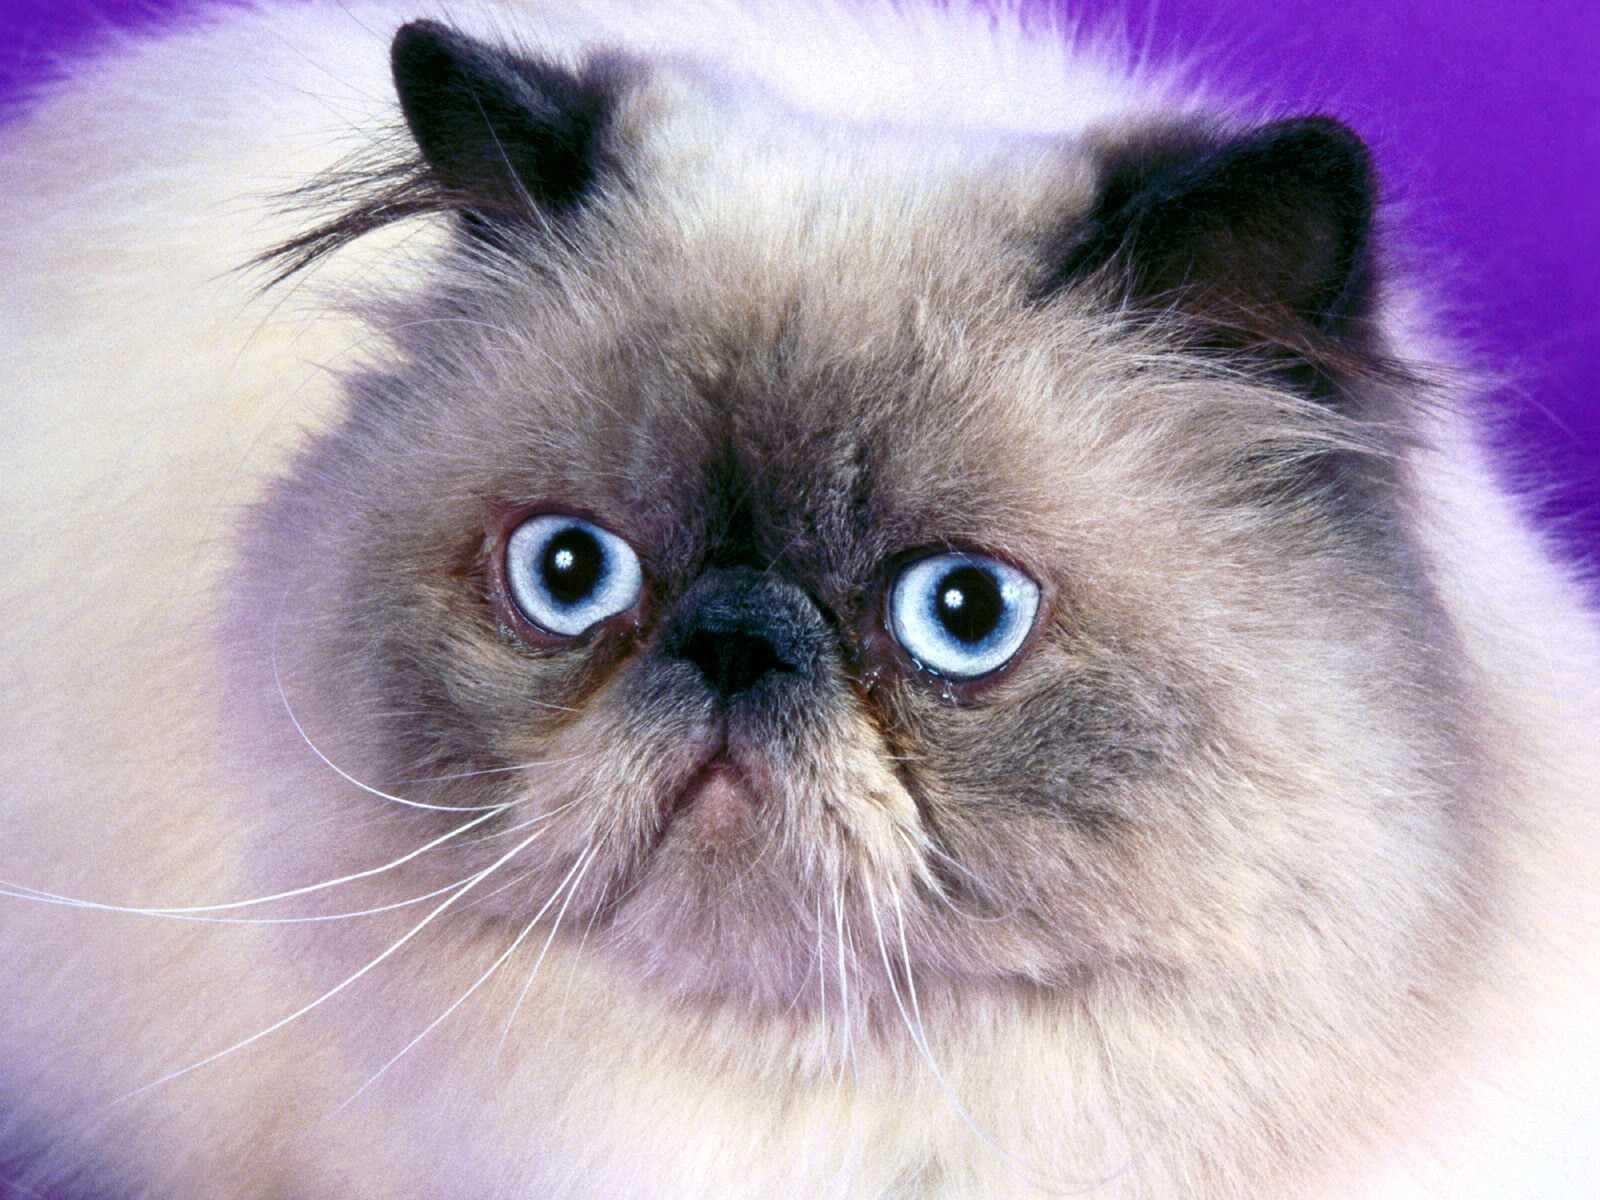 Wallpapers Hd Para Facebook Gatos Cats Mascotas Wallpapers Fondos De Pantalla Hd